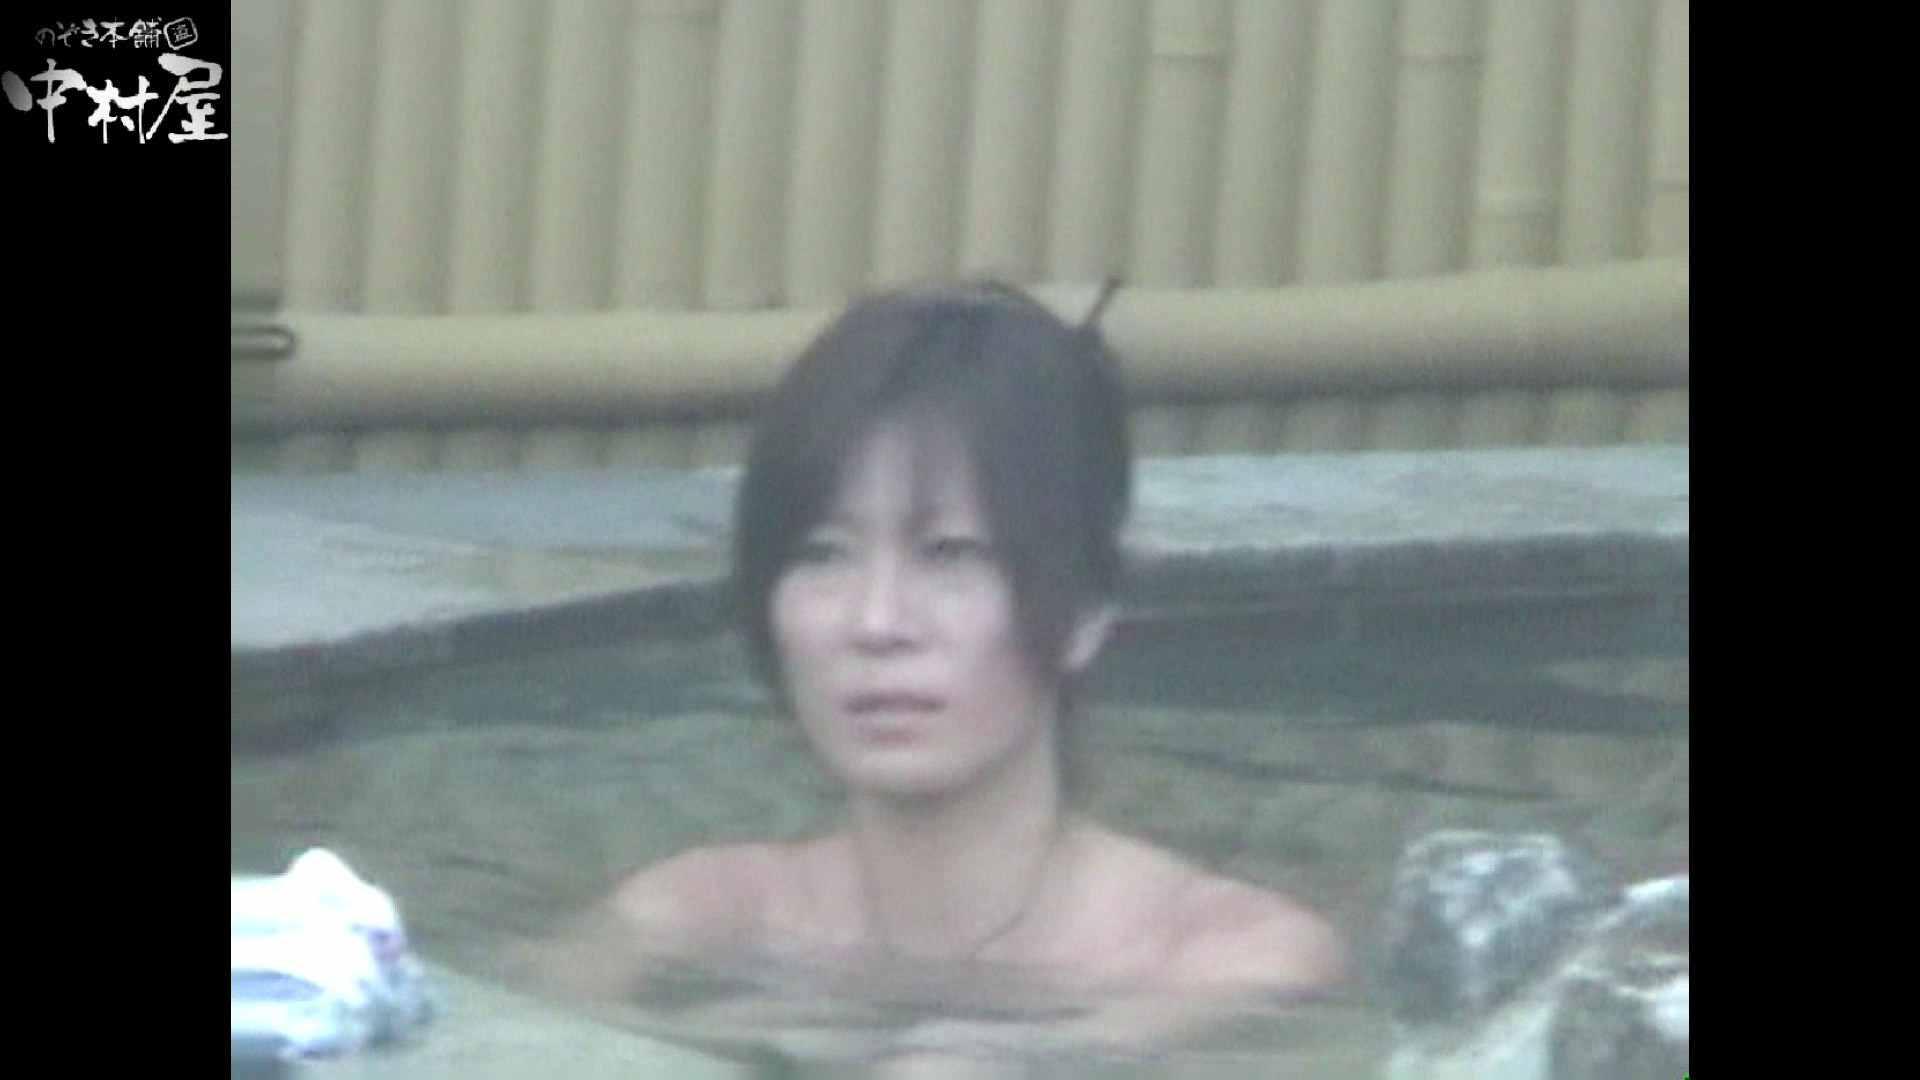 Aquaな露天風呂Vol.972 盗撮 おまんこ動画流出 80画像 59